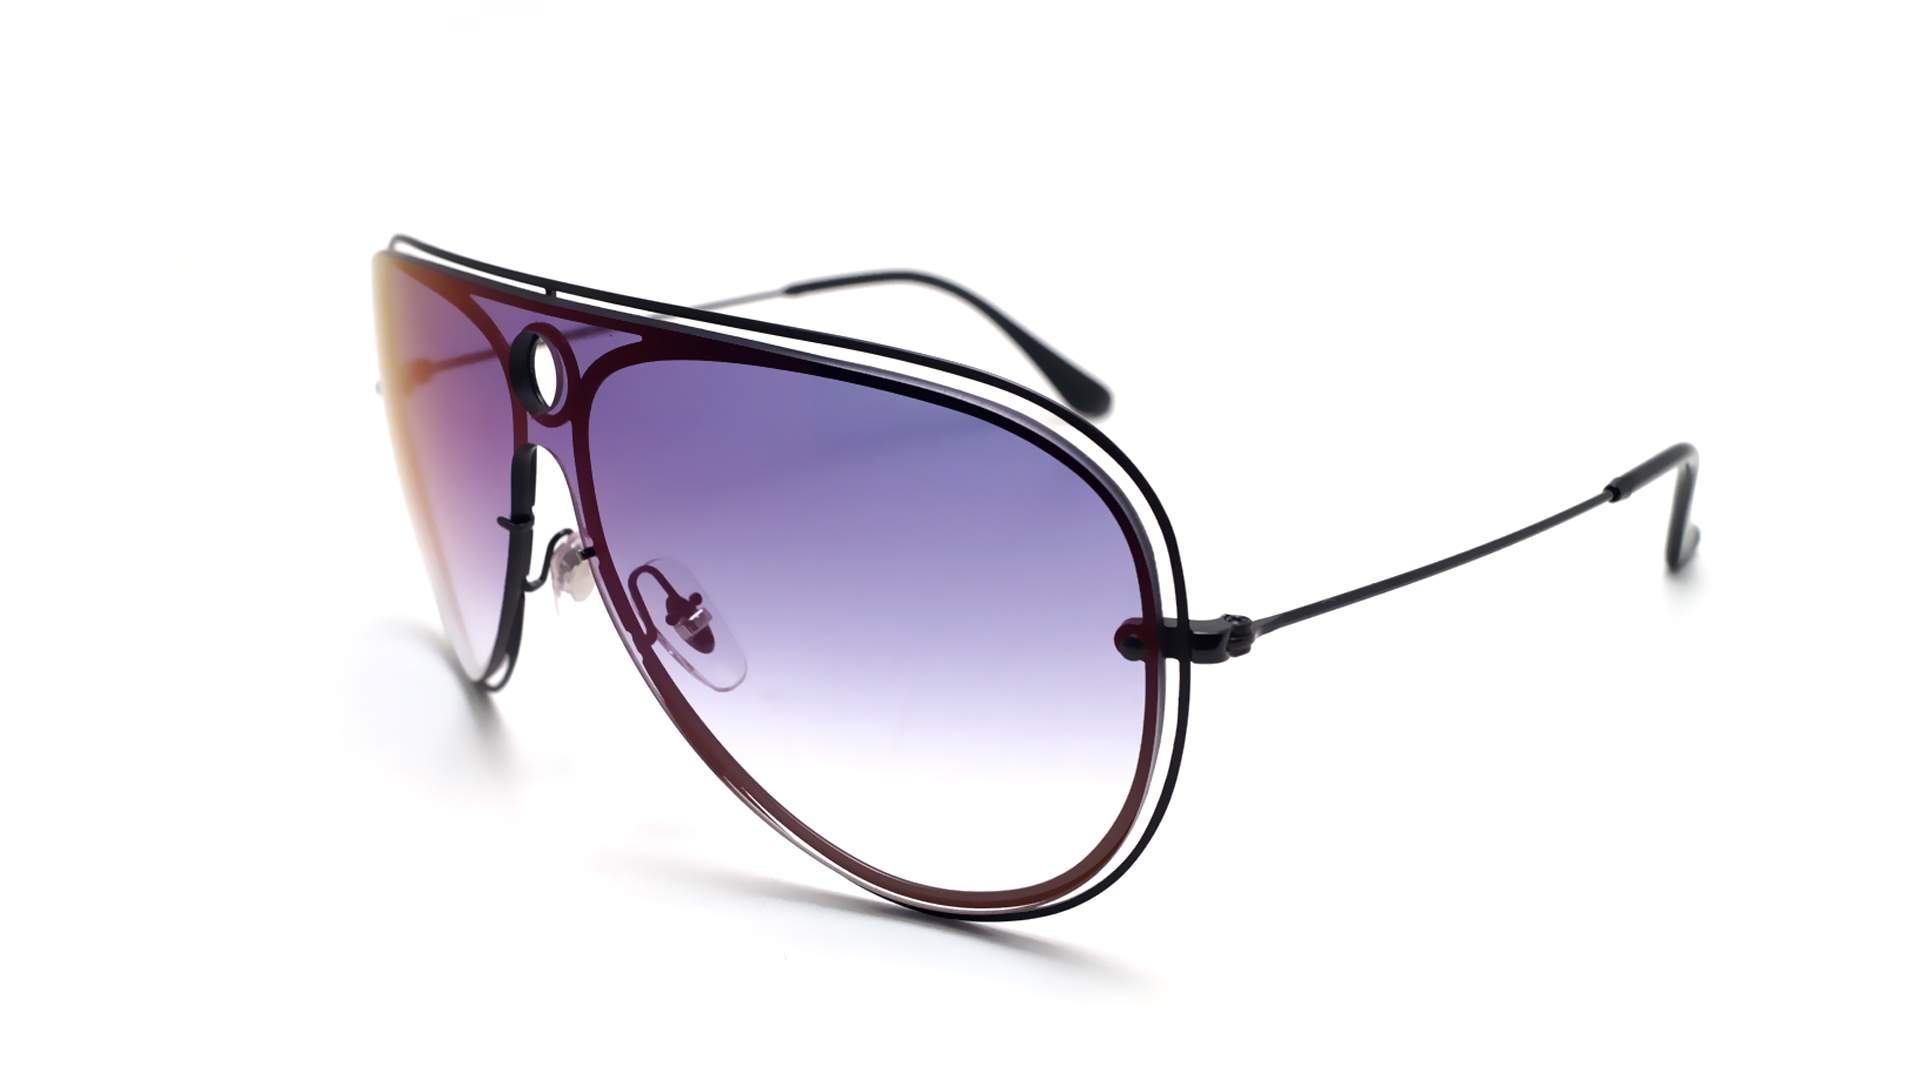 8f95596040 Sunglasses Ray-Ban Shooter Blaze Black RB3605N 186 X0 32-20 Medium Gradient  Mirror